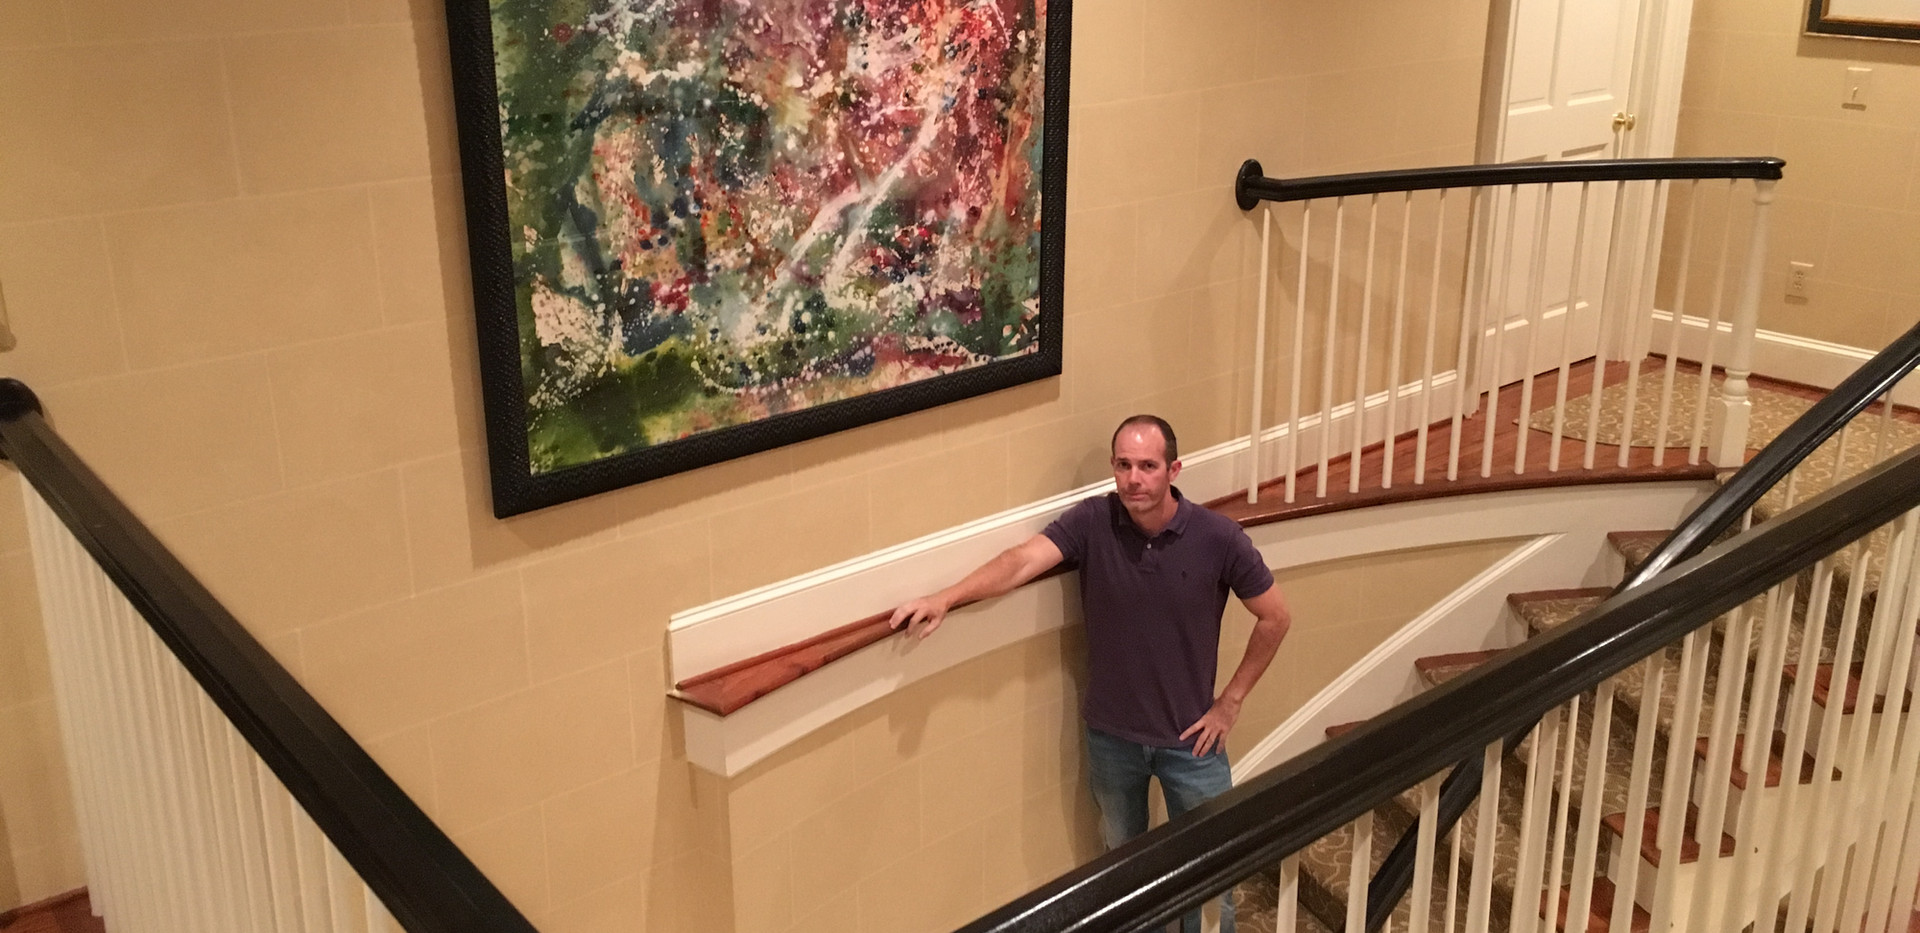 Rob-Shaw-portrait-hanging